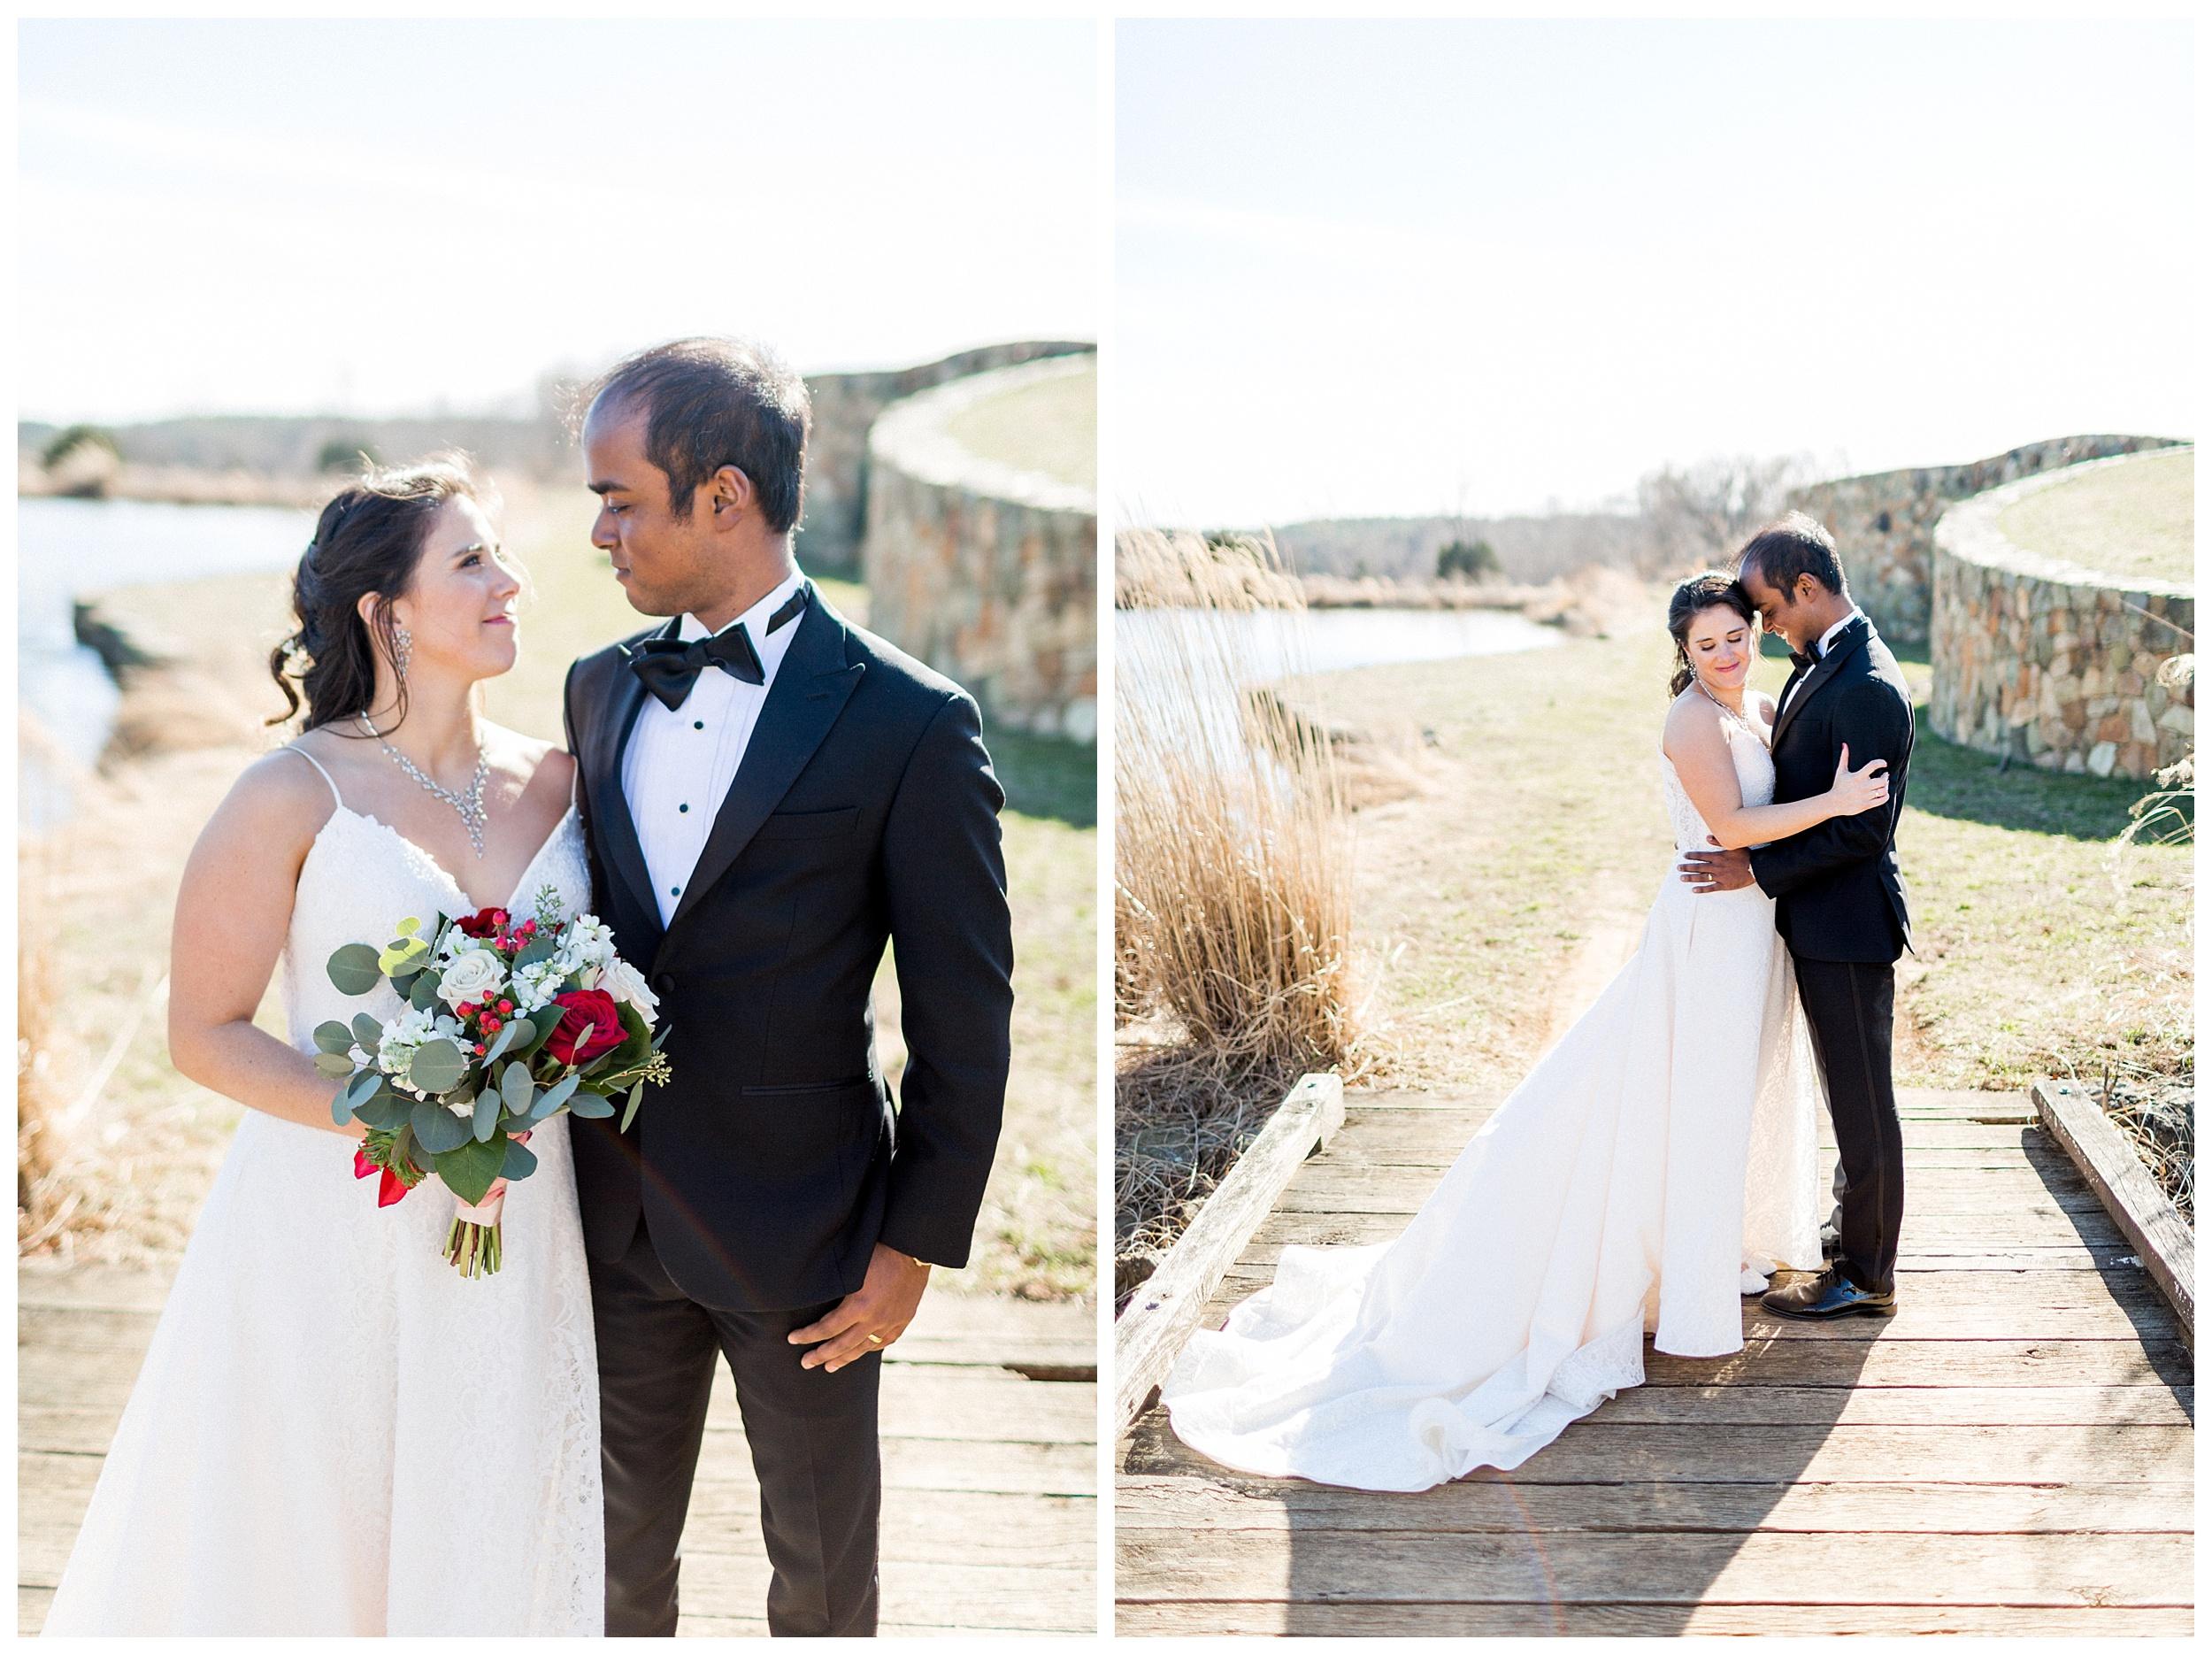 Stone Tower Winery Wedding | Virginia Winter Wedding | VA Wedding Photographer Kir Tuben_0057.jpg